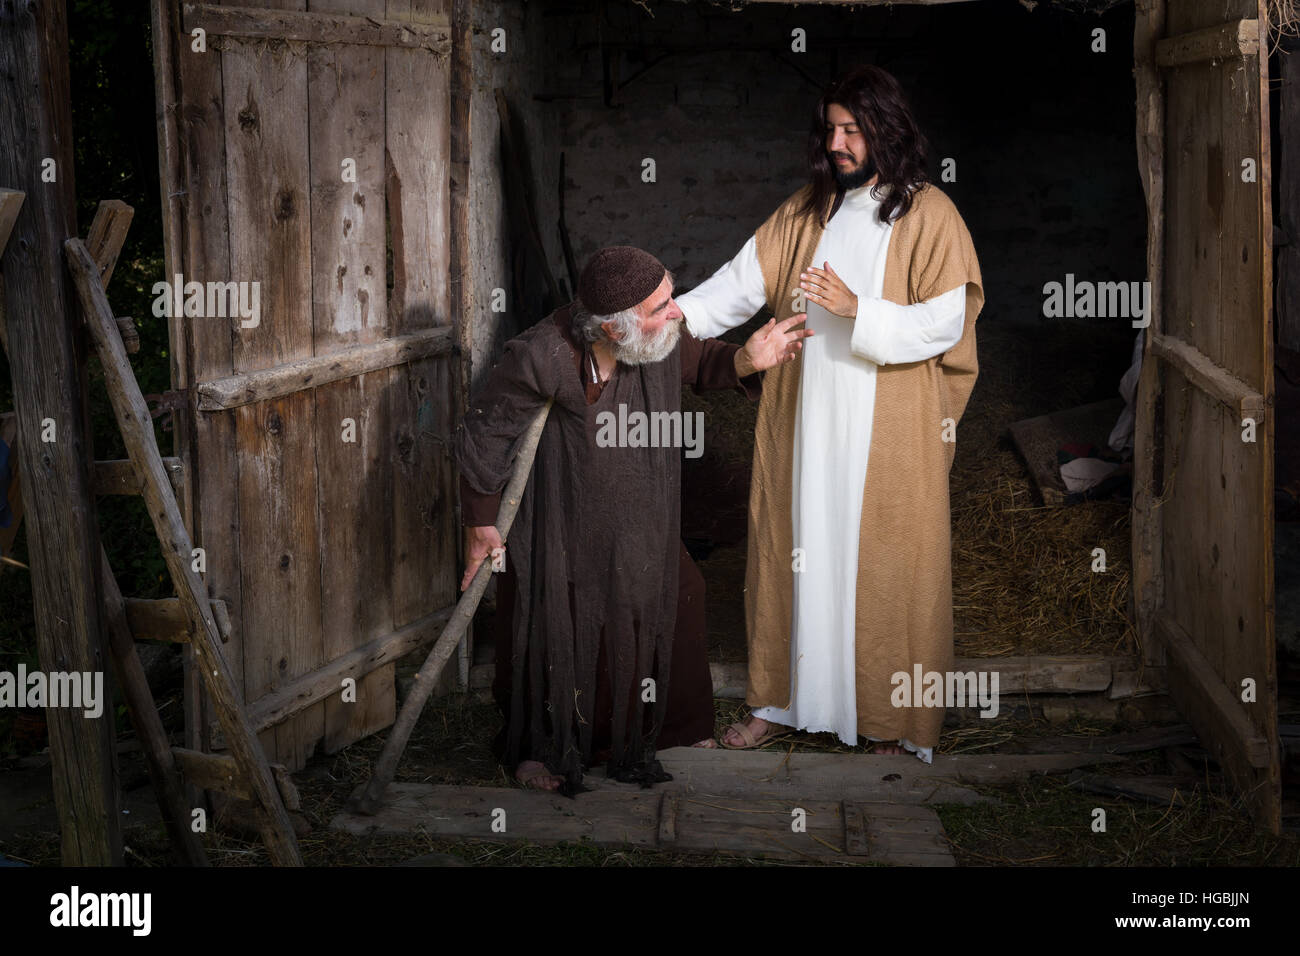 Jesus healing the lame or crippled man - Stock Image